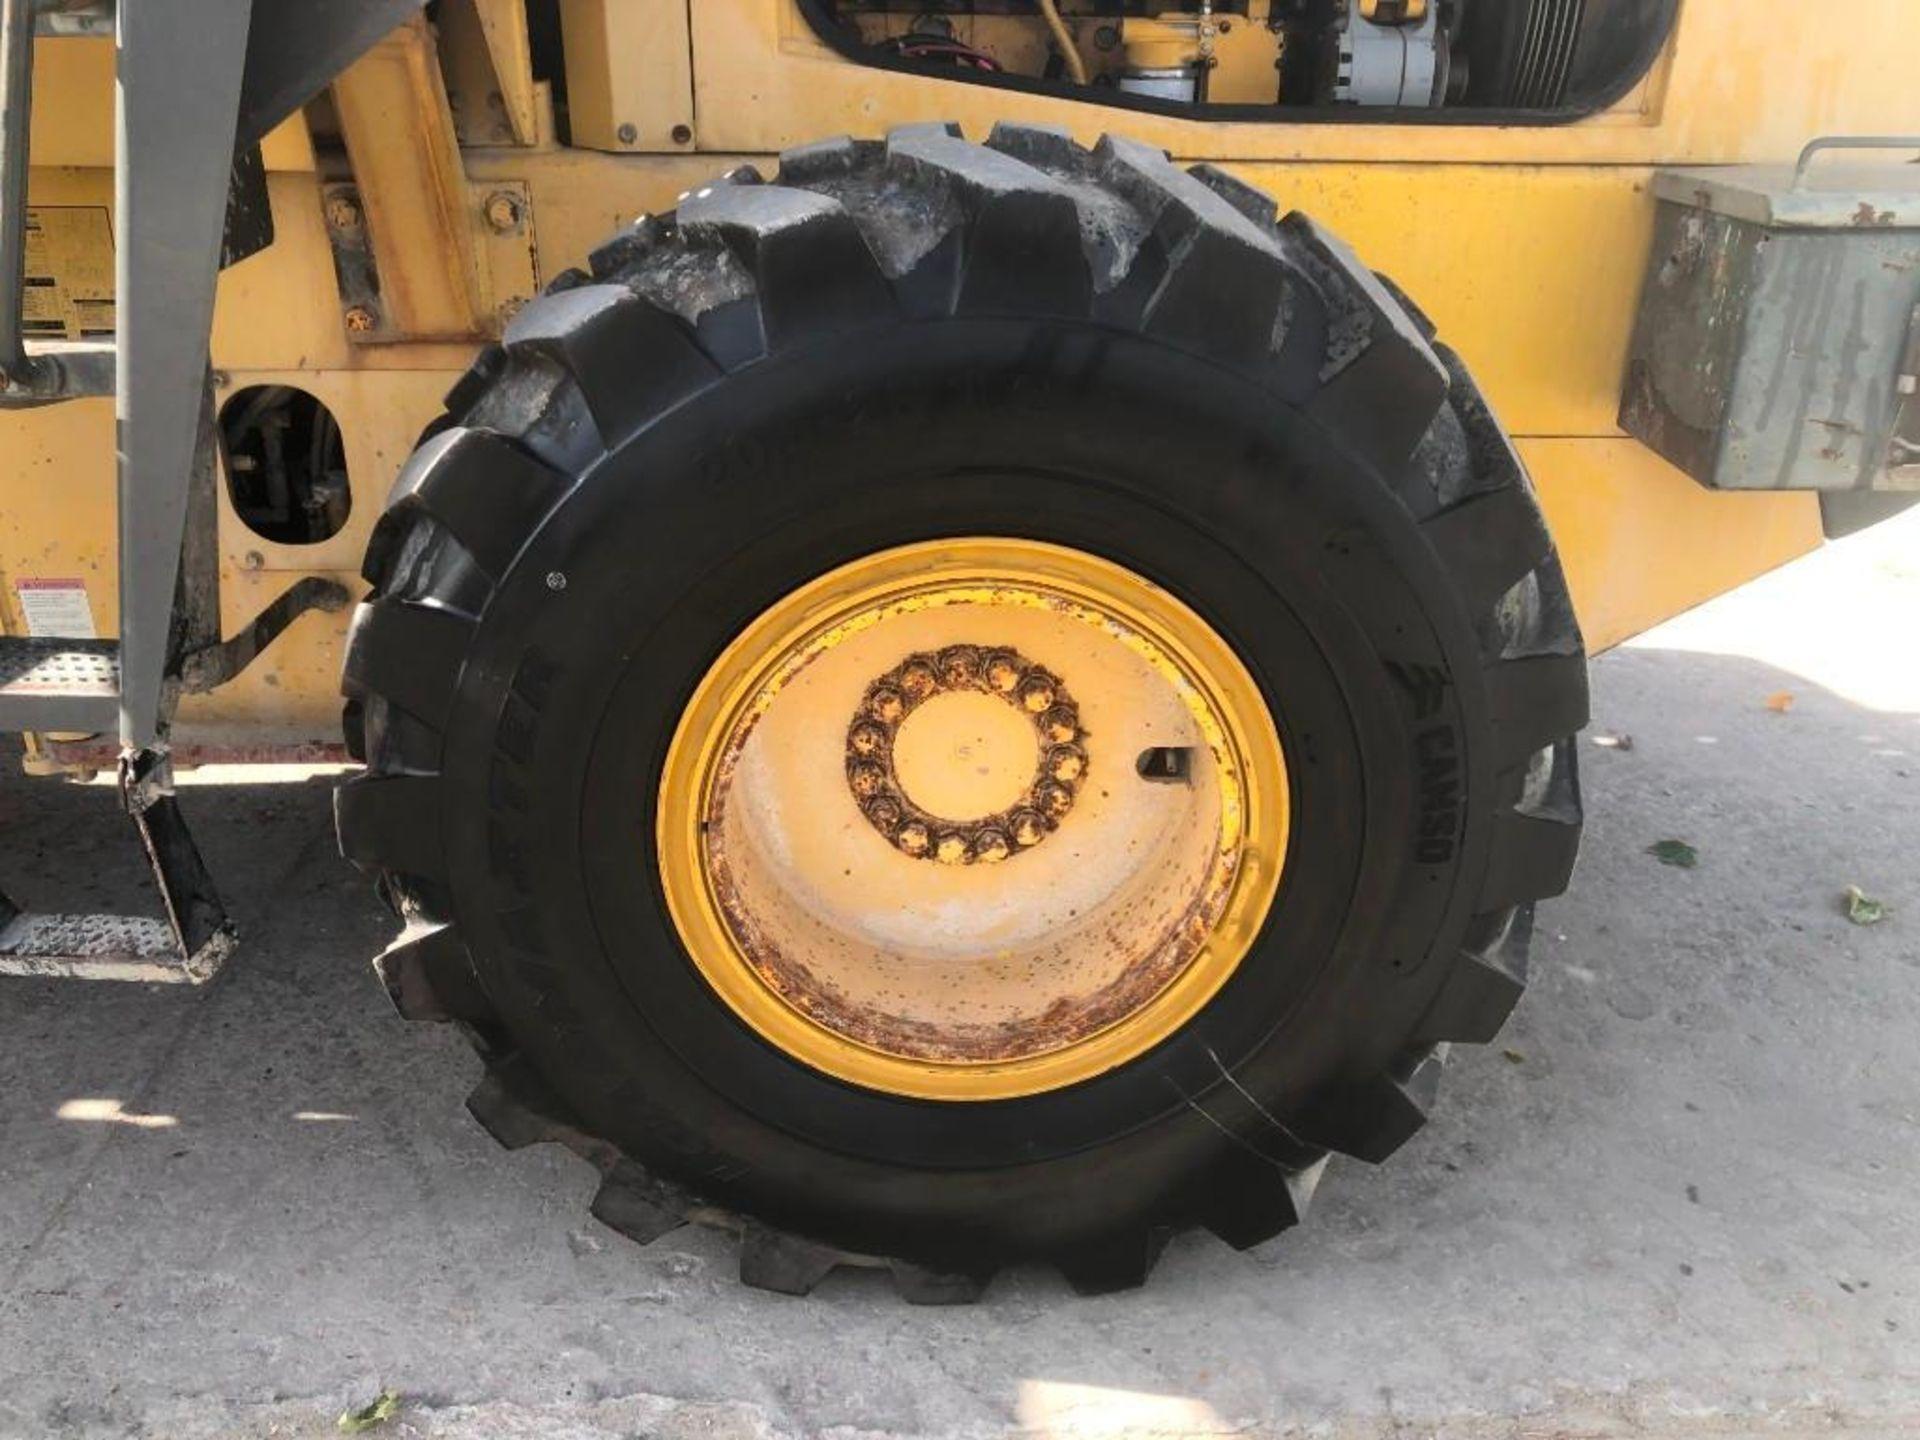 1998 Komatsu Rubber Tire Loader, Model WA320-3L, Serial #A30378, 8458 Hours, EROPS, A/C & Heat, 3. - Image 26 of 31